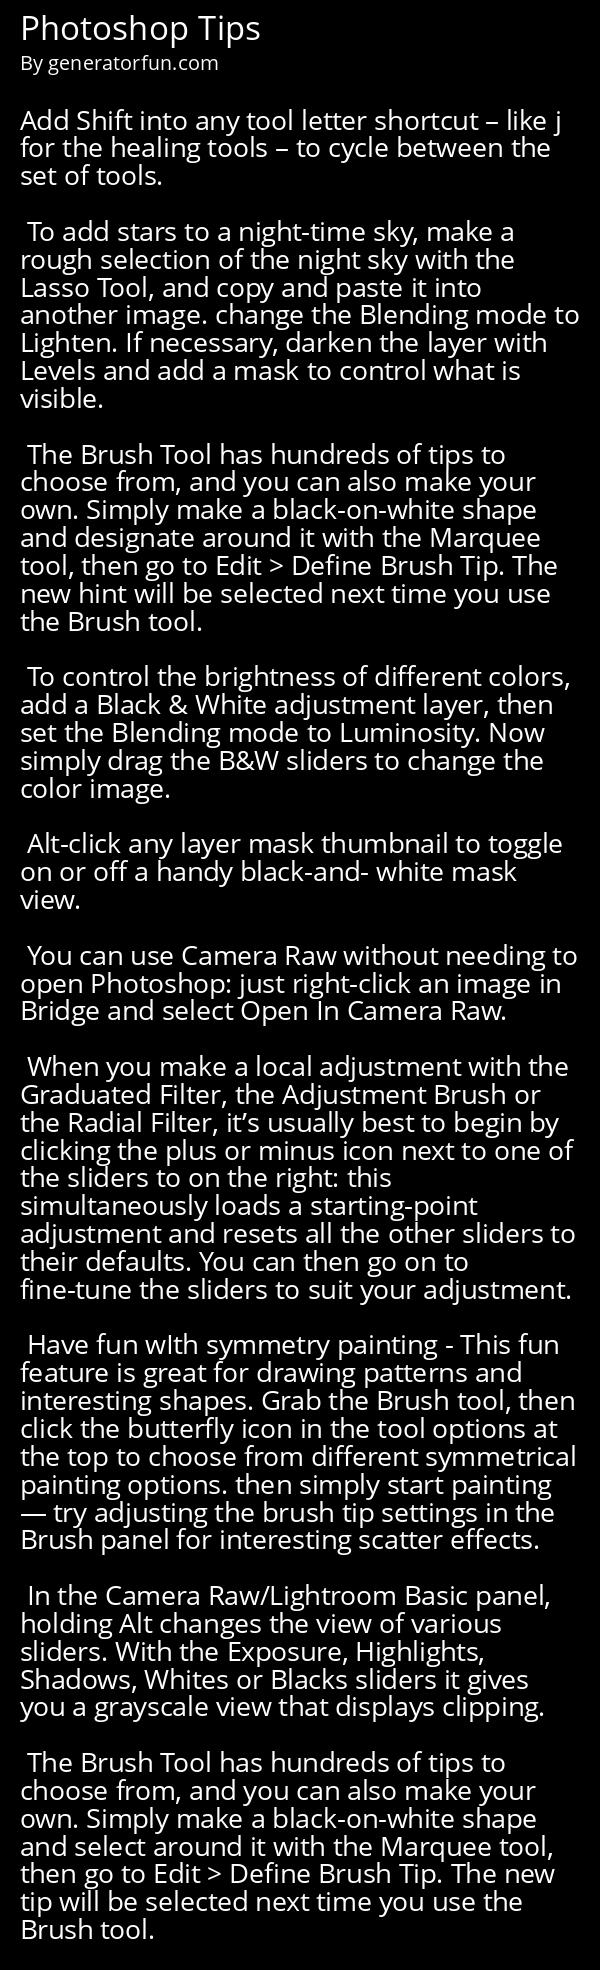 Photoshop Tips